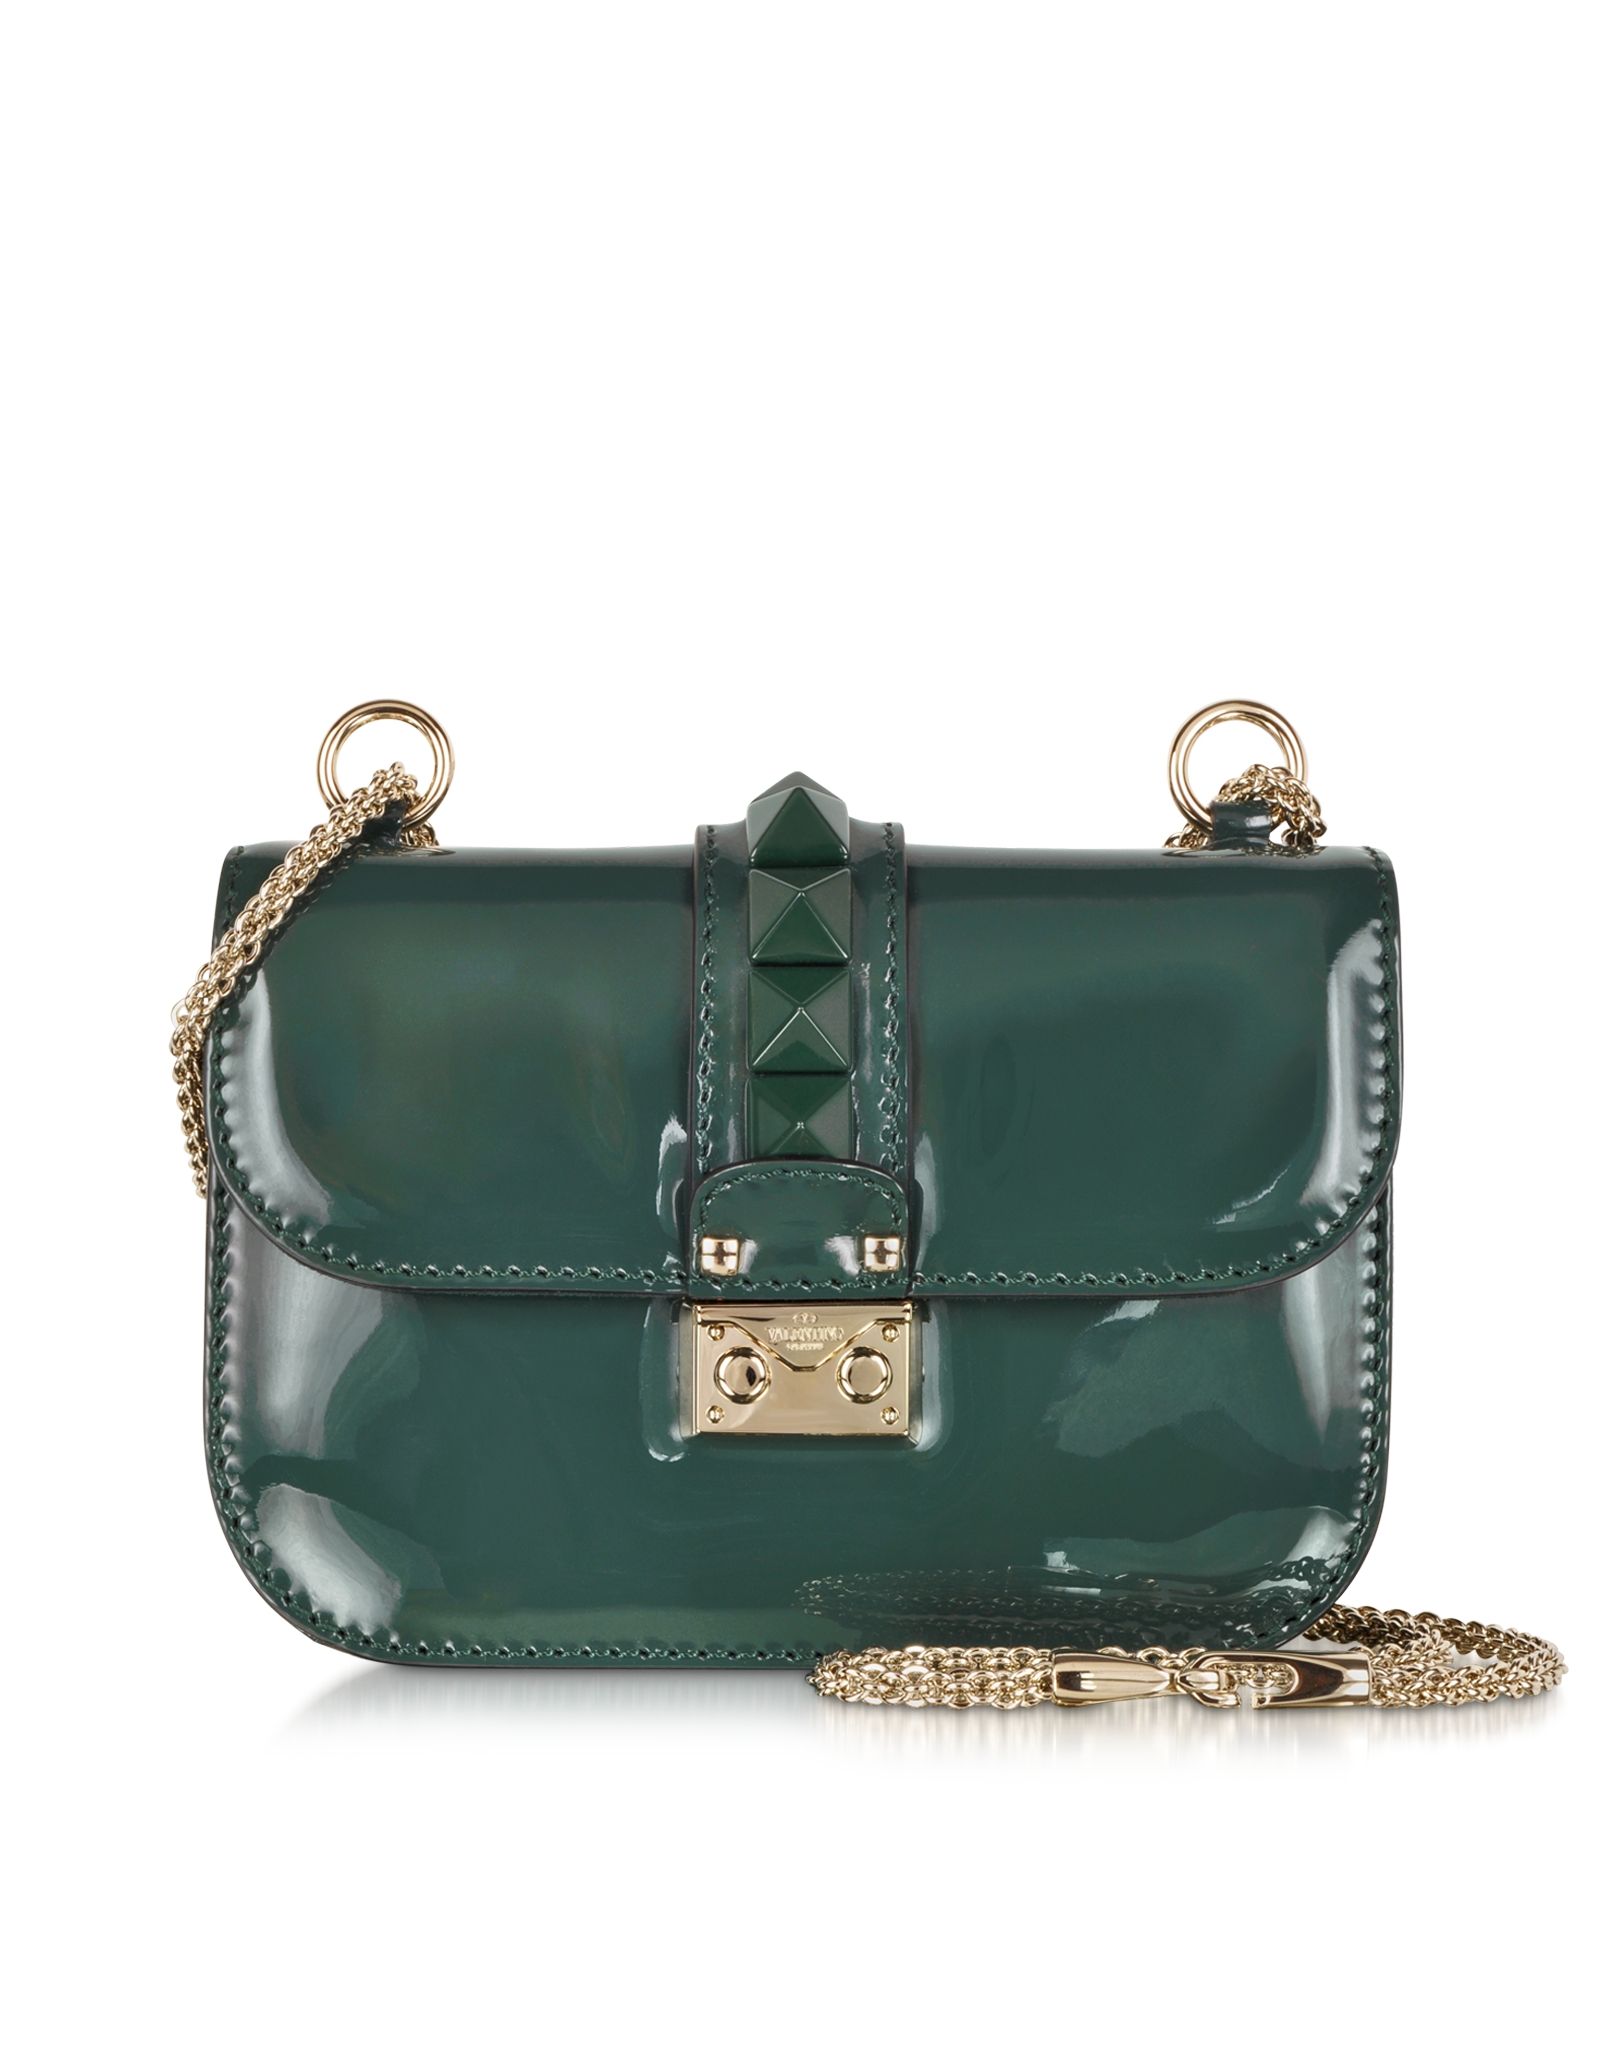 Valentino Rockstud Small Dark Green Leather Shoulder Bag